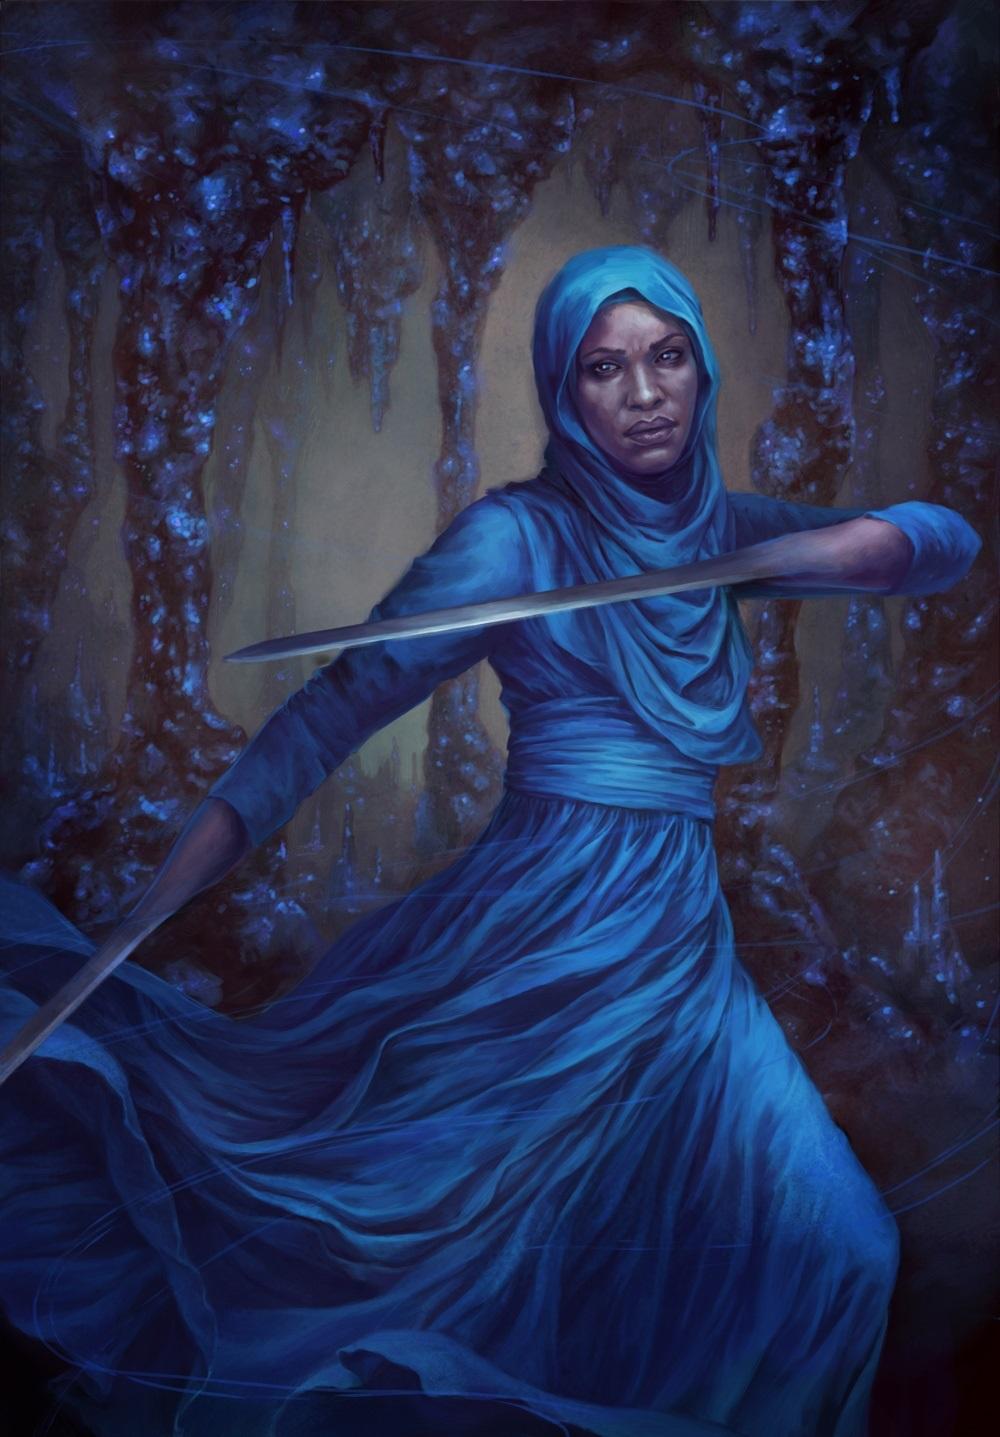 Meet a Time-Traveling, Shapeshifting Hijabi Defender of Humanity